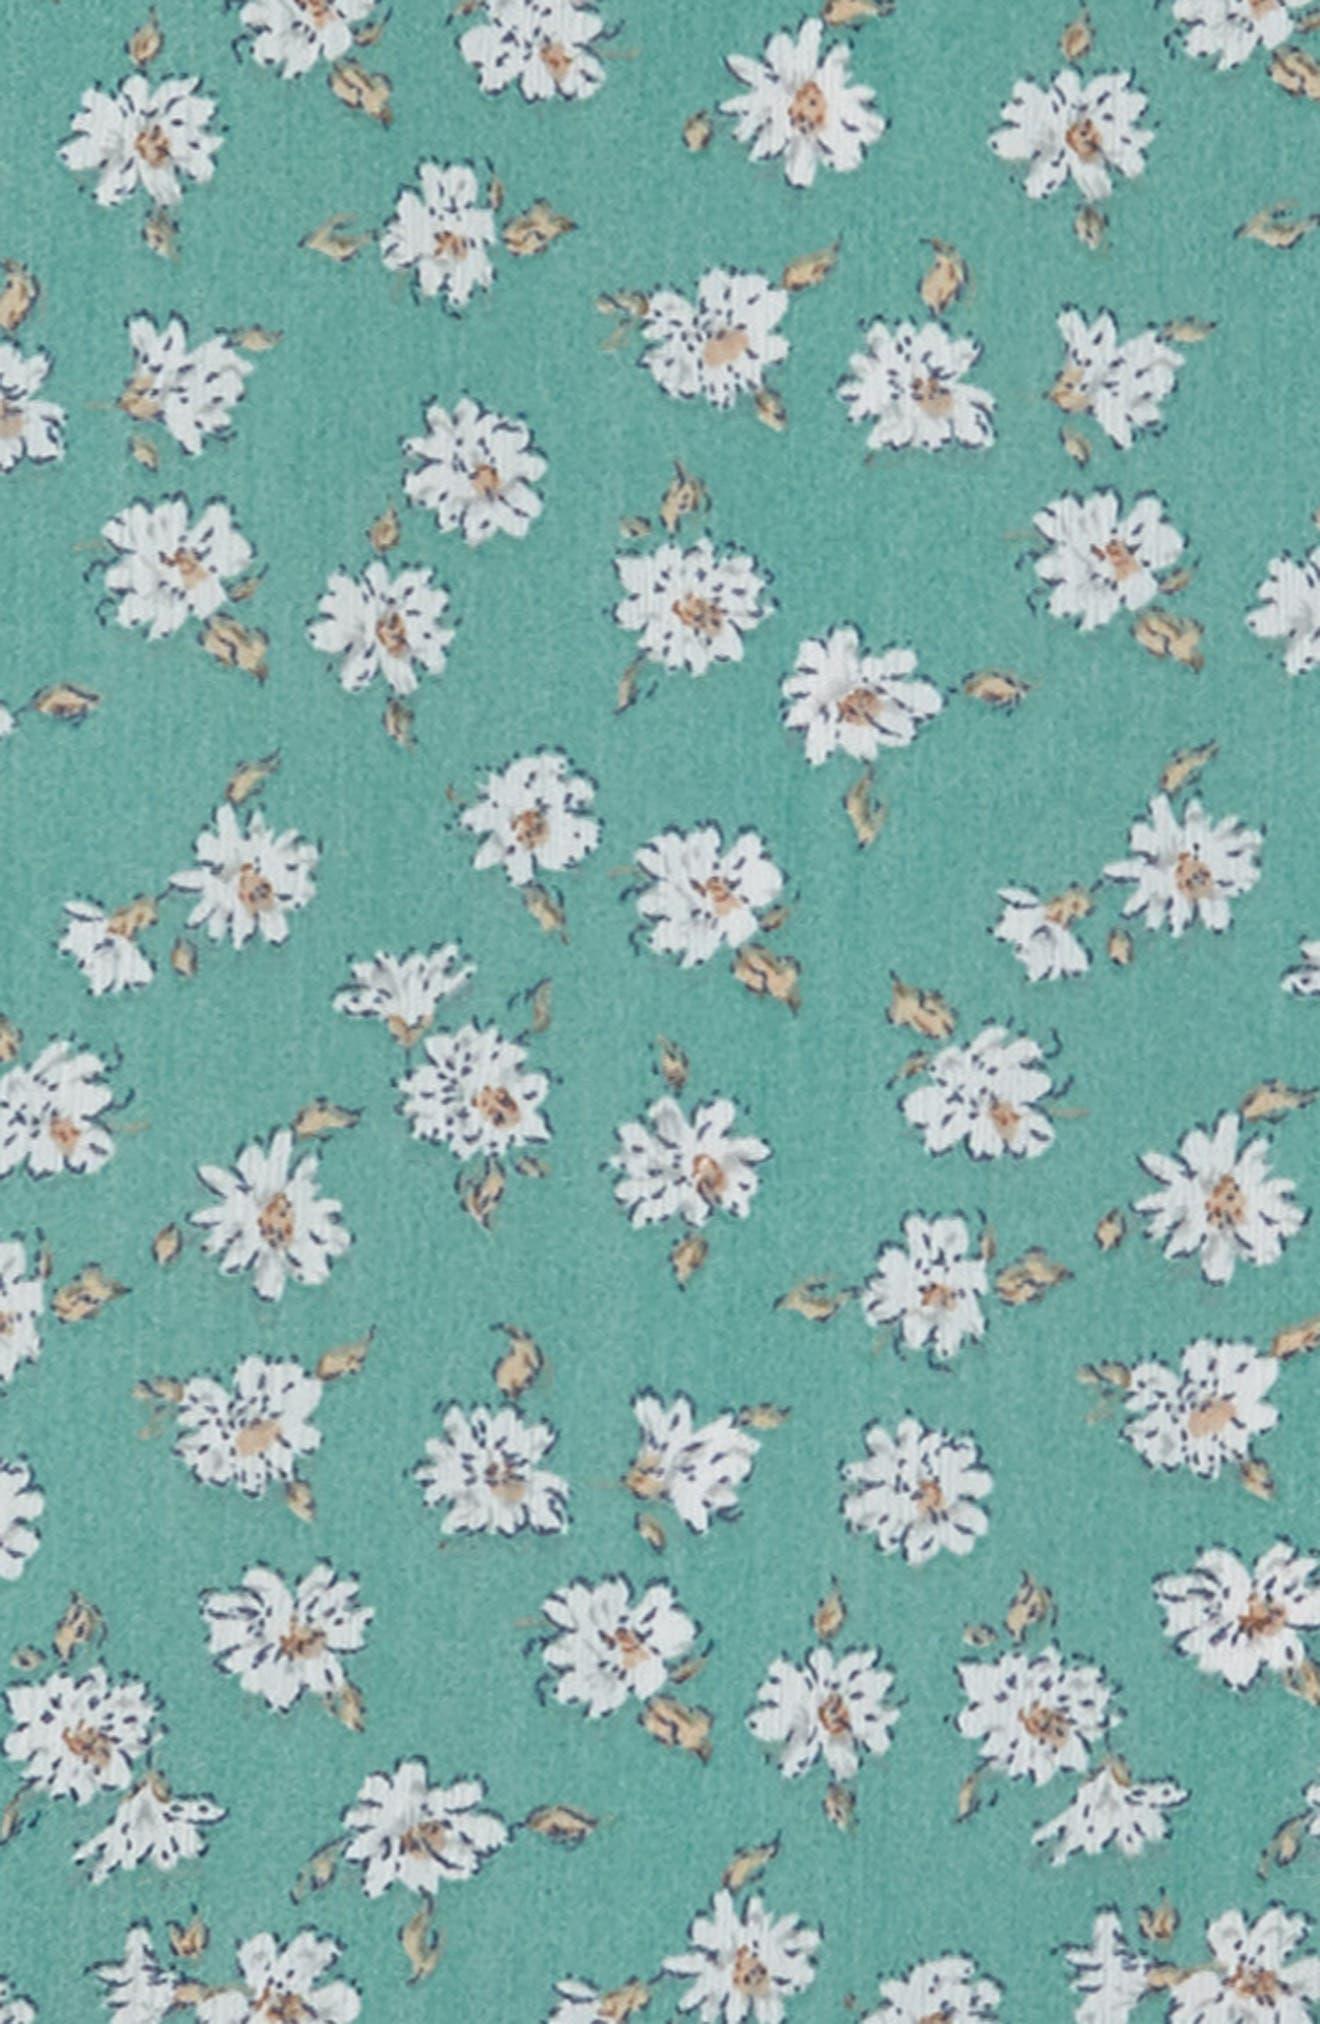 Brooklyn Floral Drop Waist Dress,                             Alternate thumbnail 3, color,                             Mint